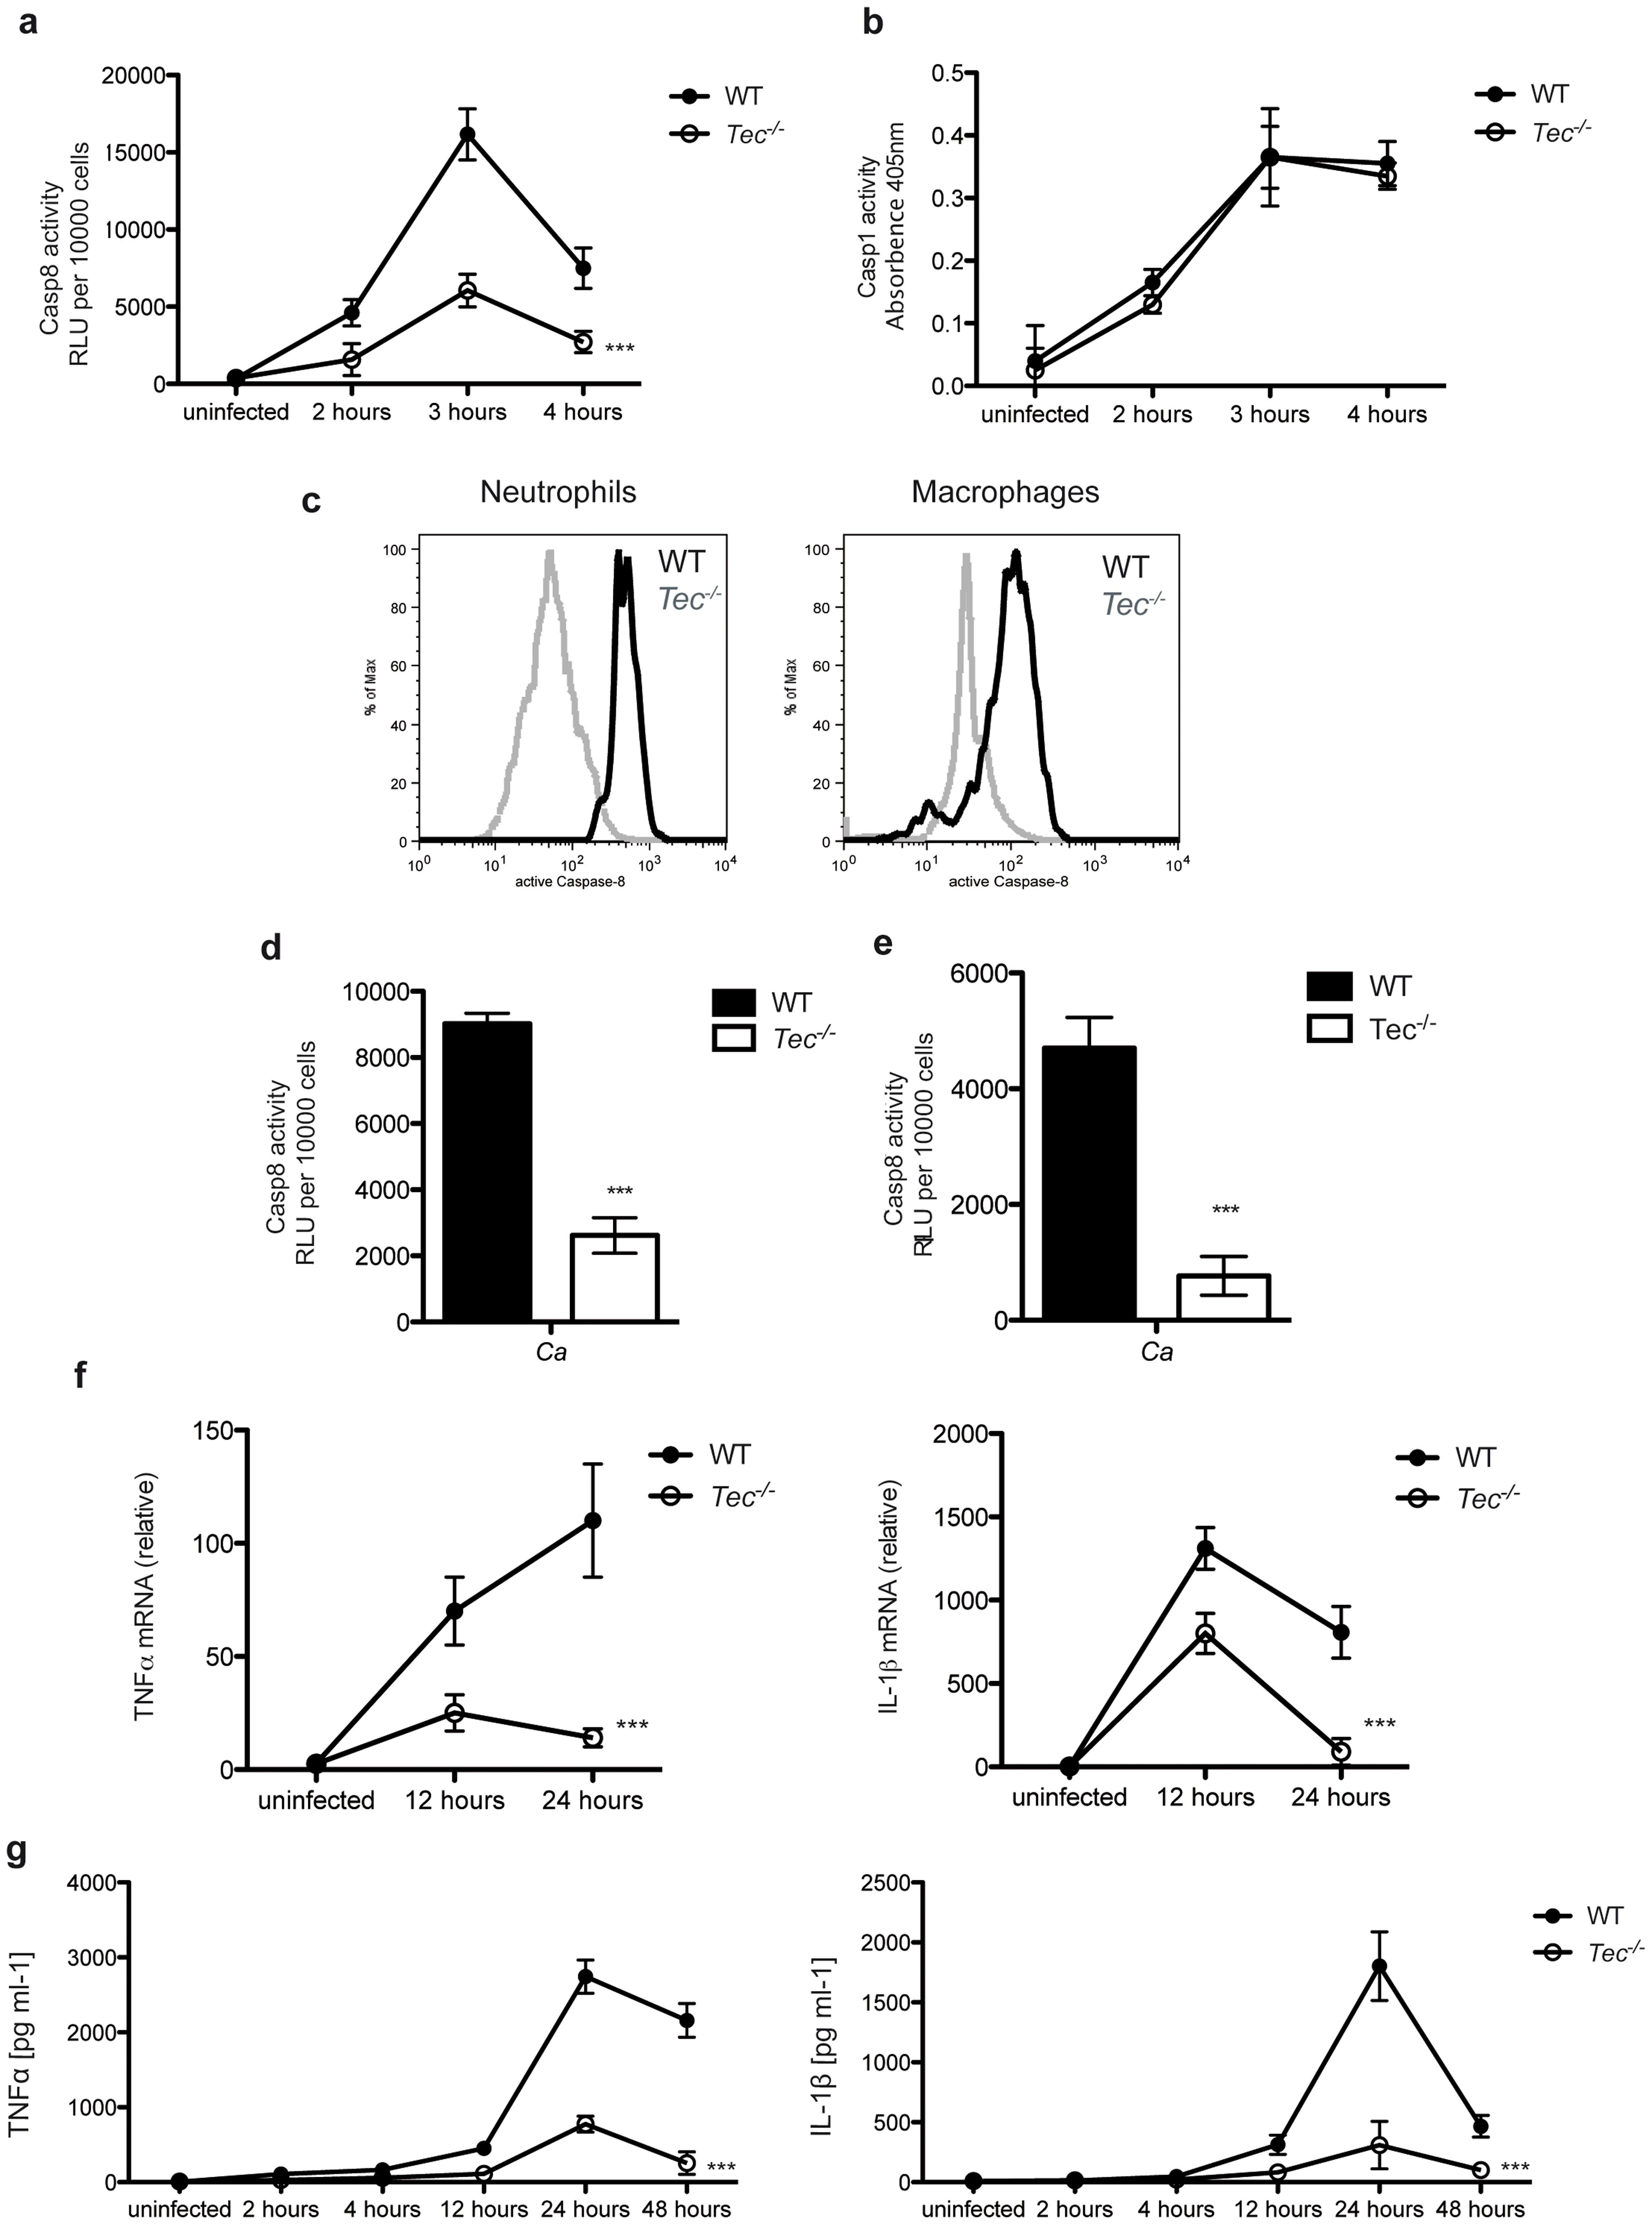 Tec regulates fungal virulence <i>in vivo</i>.